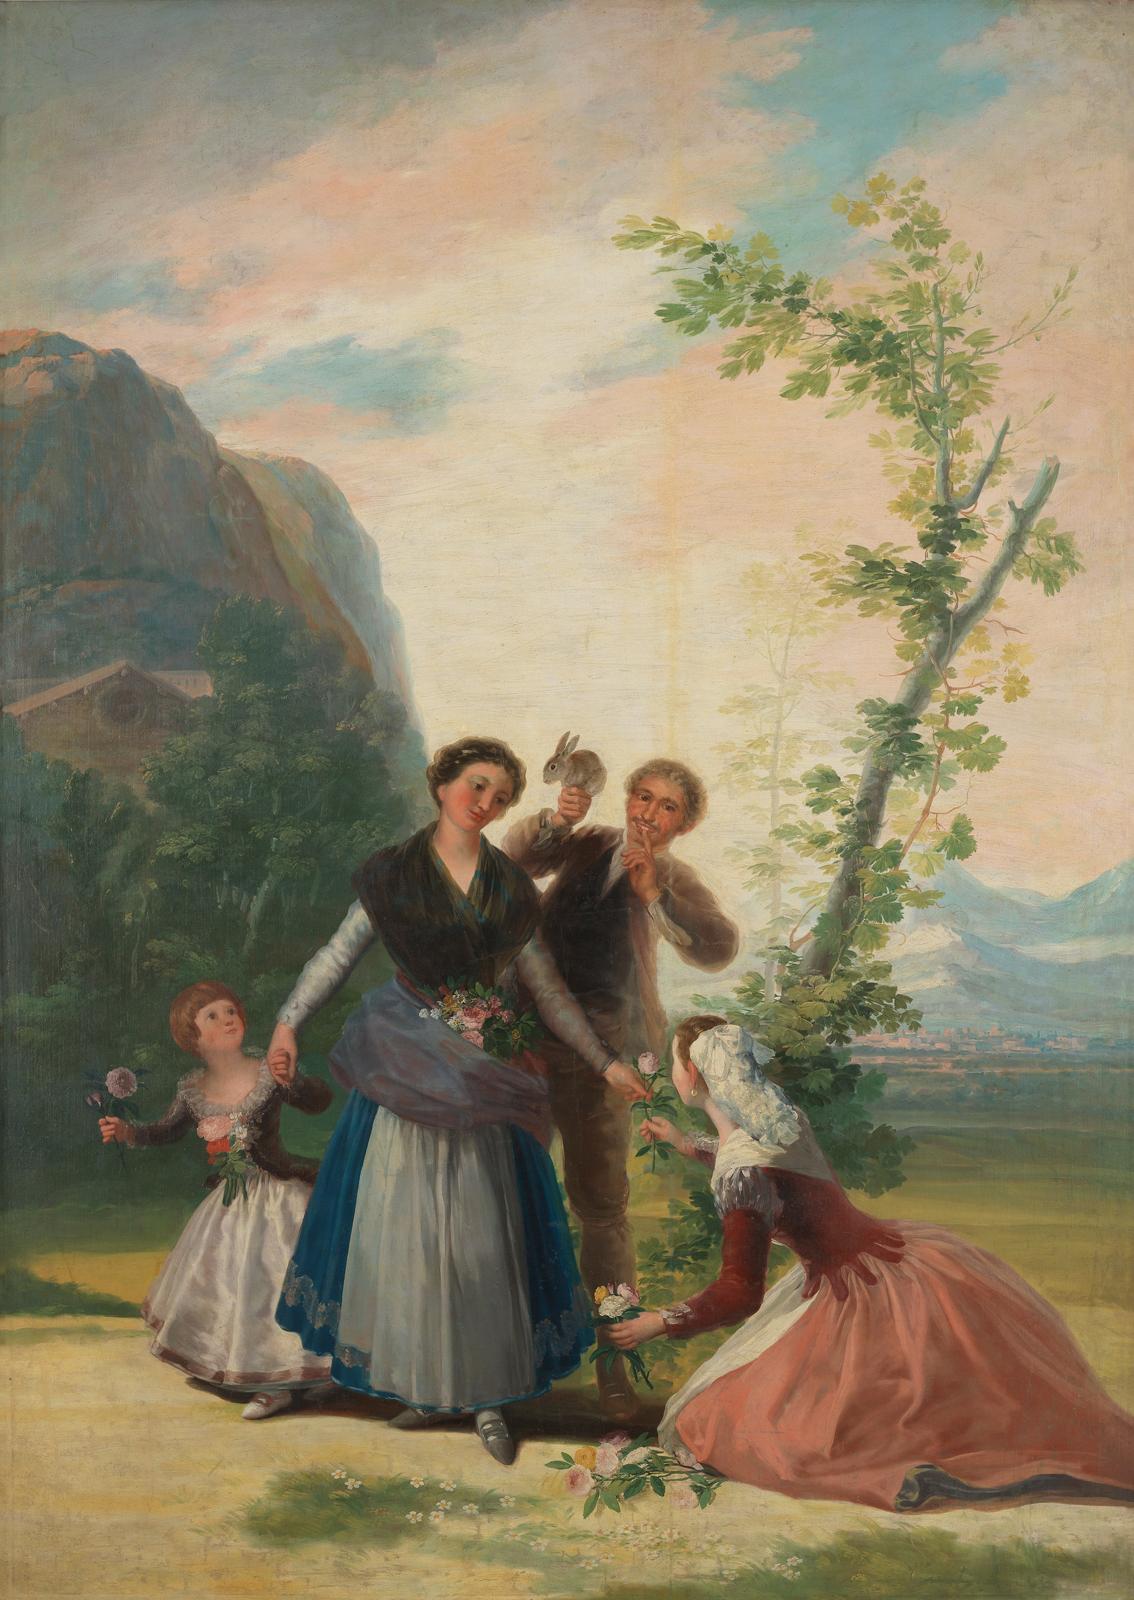 La primavera, de Goya, Madrid, Museo del Prado.